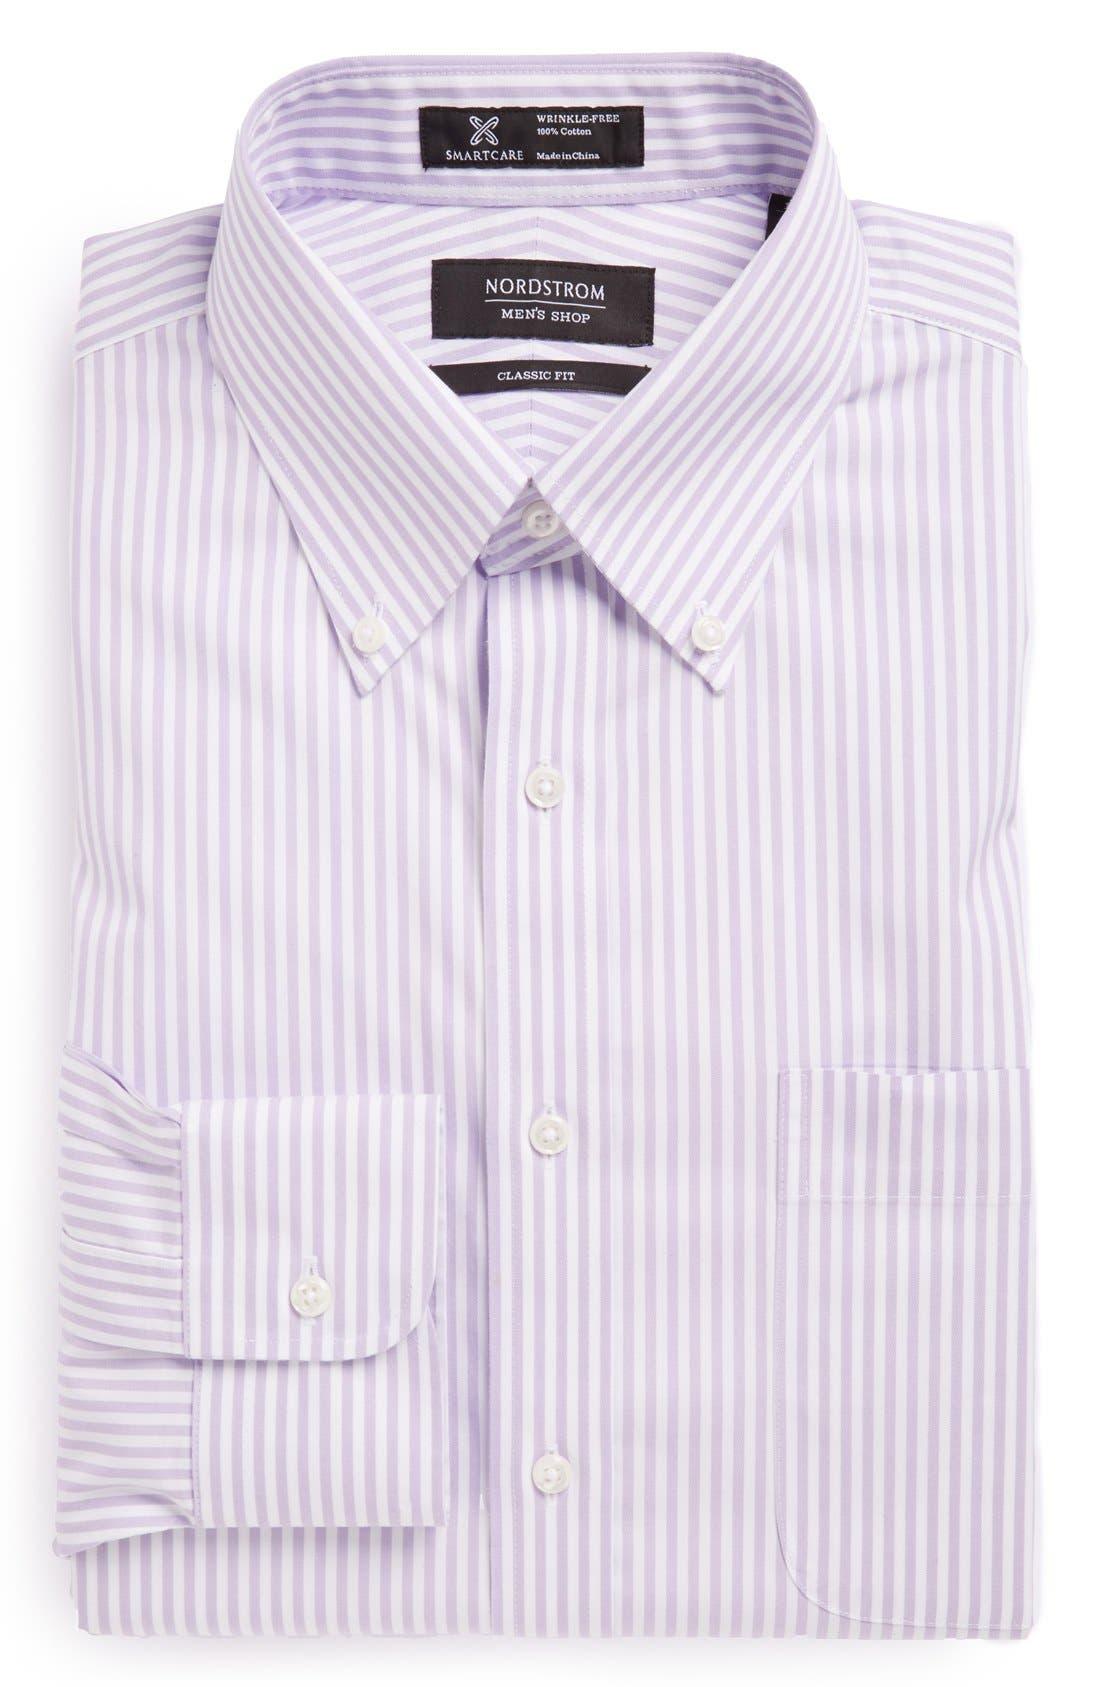 Main Image - Nordstrom Men's Shop Smartcare™ Classic Fit Stripe Dress Shirt (Online Only)